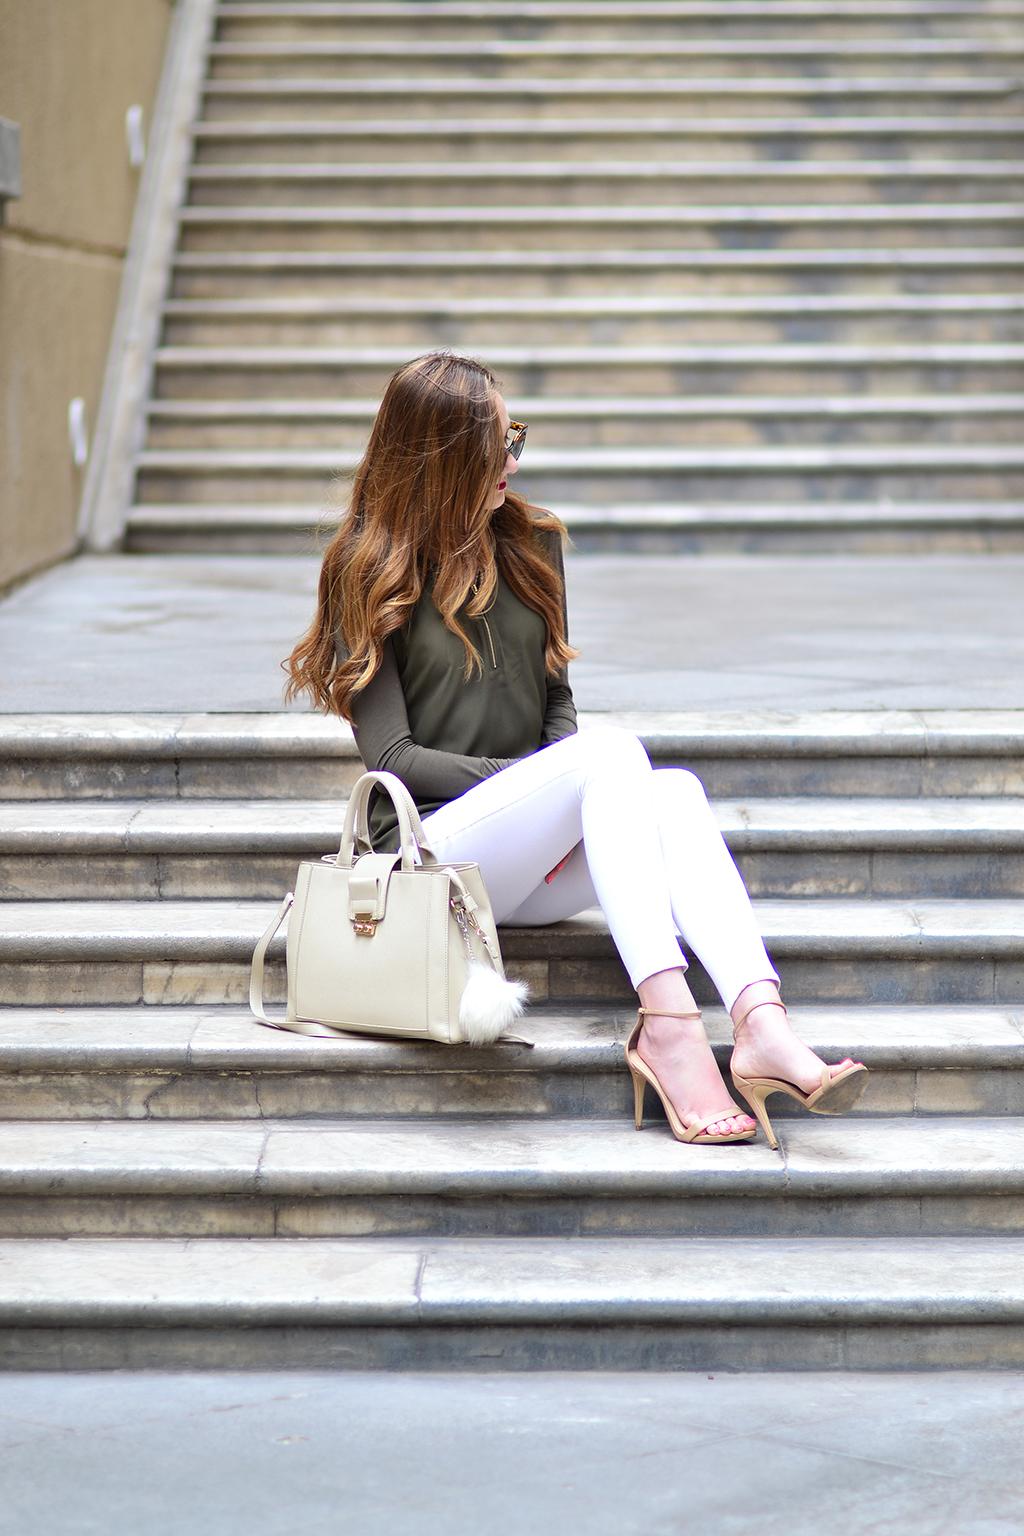 arum-lilea-forever-new-top-steve-madden-heels